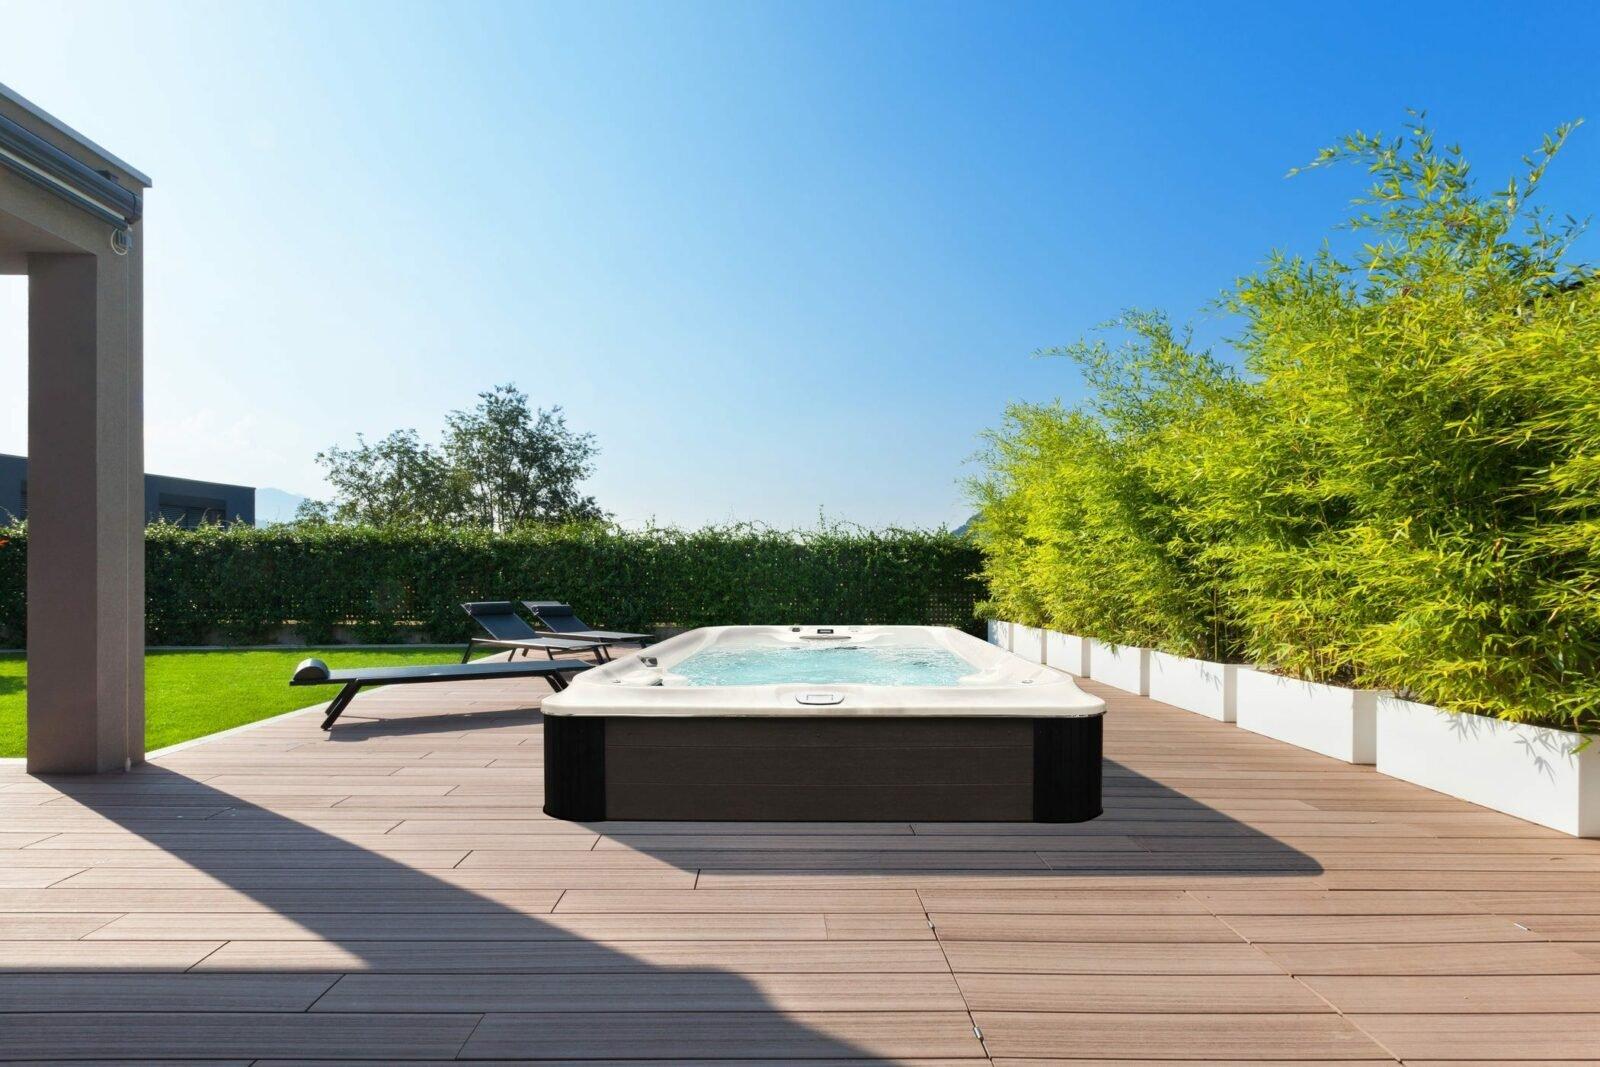 outdoor jacuzzi brand swim spa in Western New York